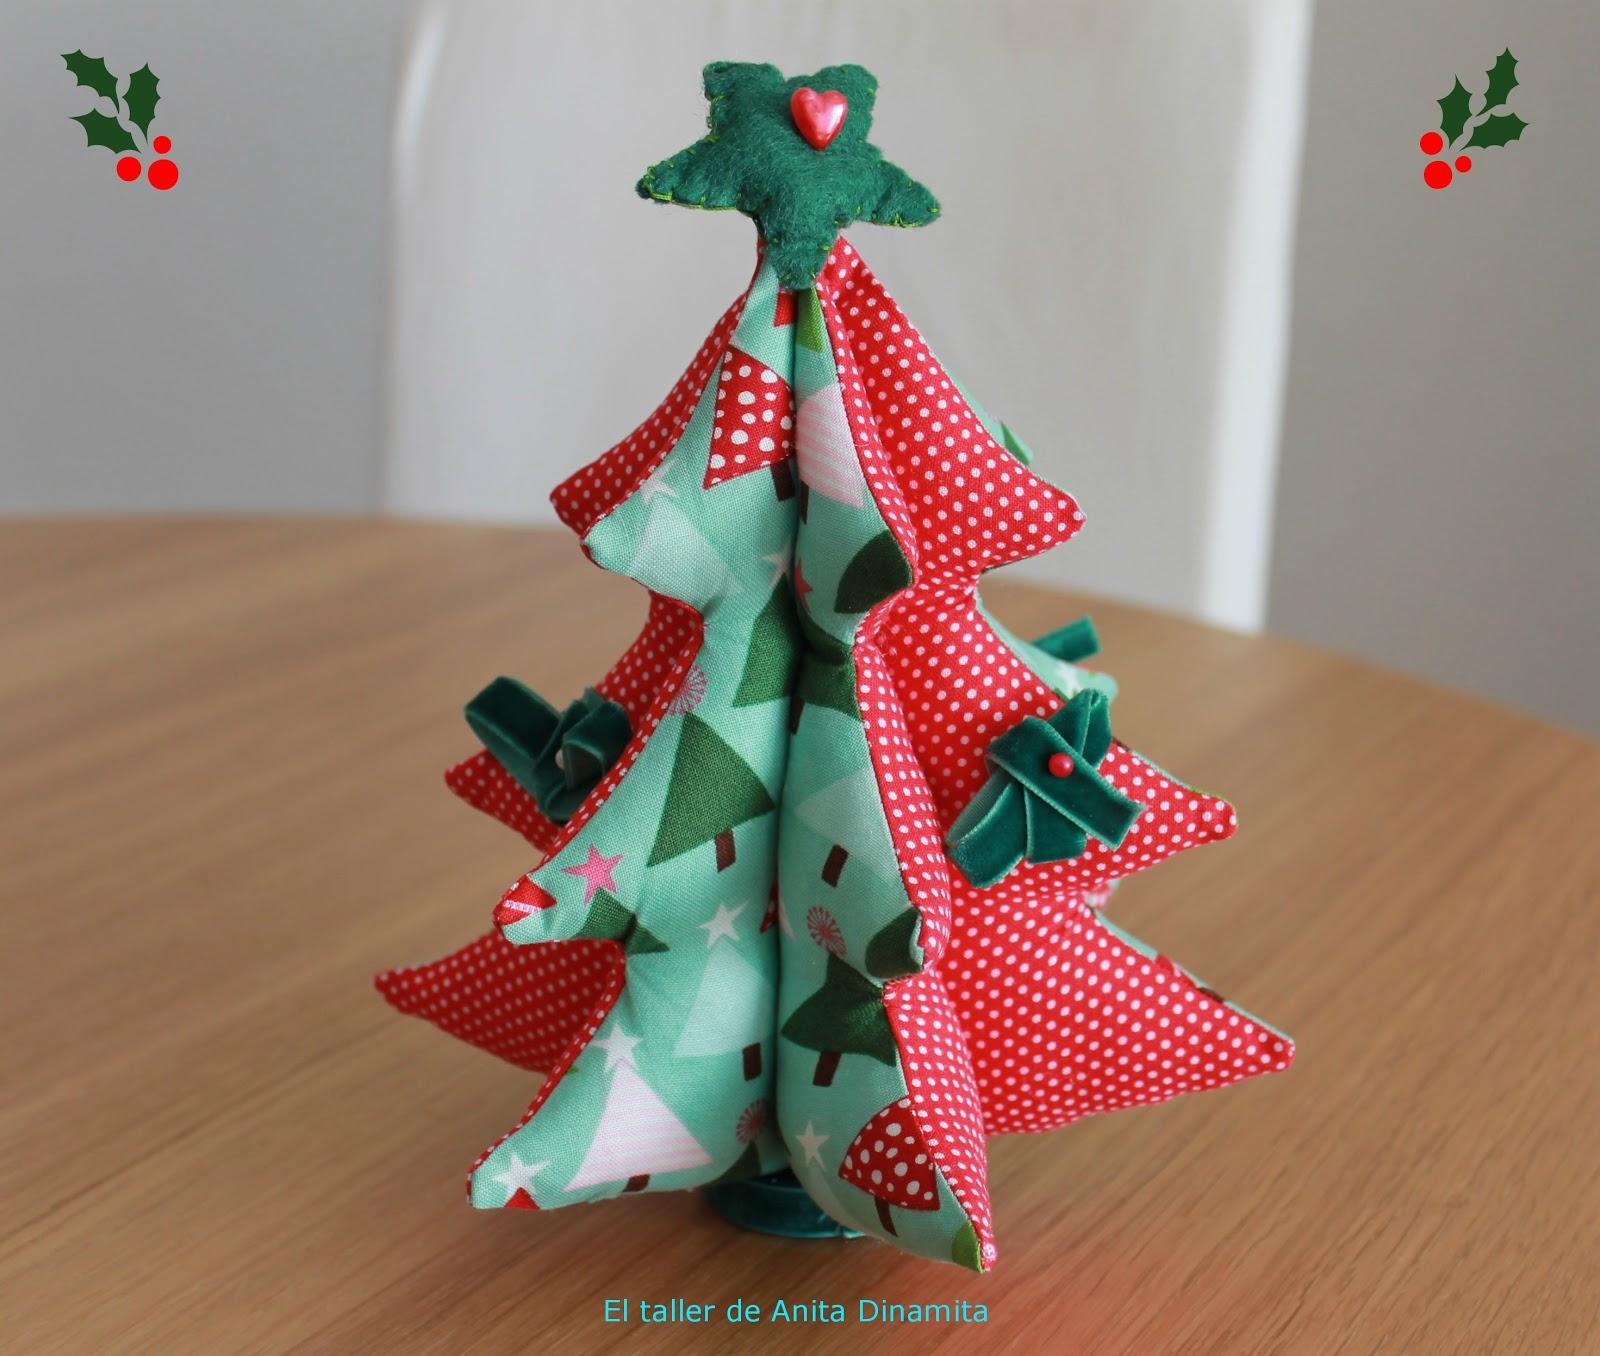 arbolito navideo de tela - Arbol De Navidad De Tela